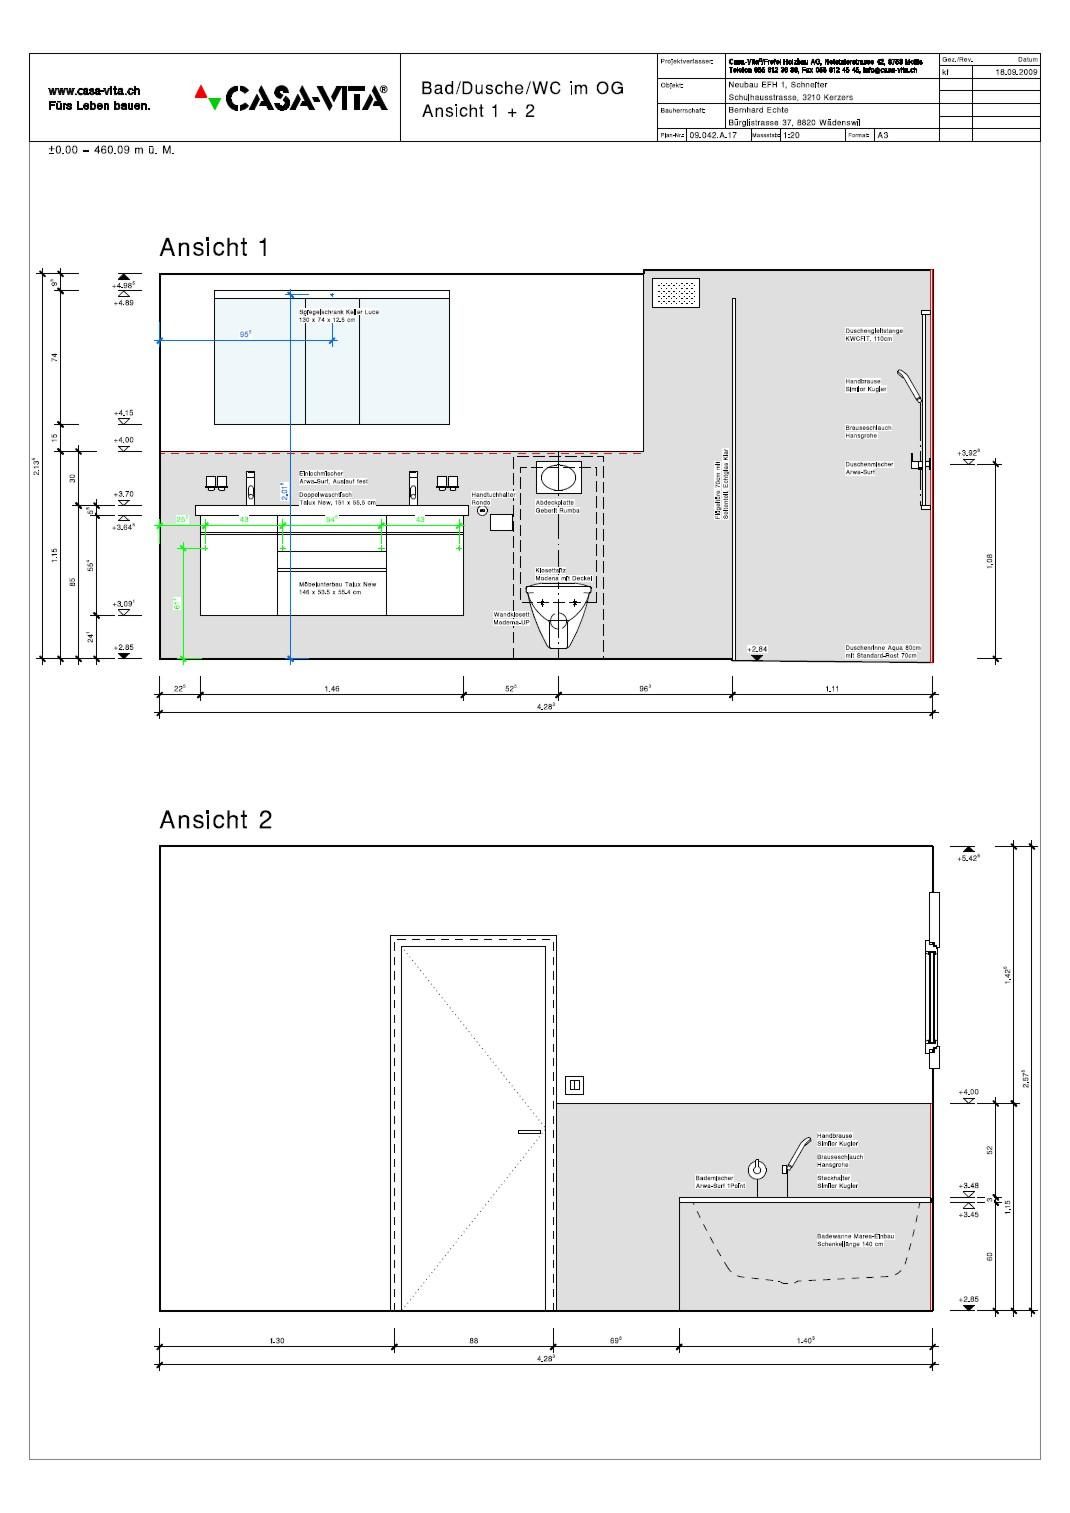 homepage, dokument, webpage, page, web, netz, homepage dokument ... | {Küchenplanung ansicht 28}